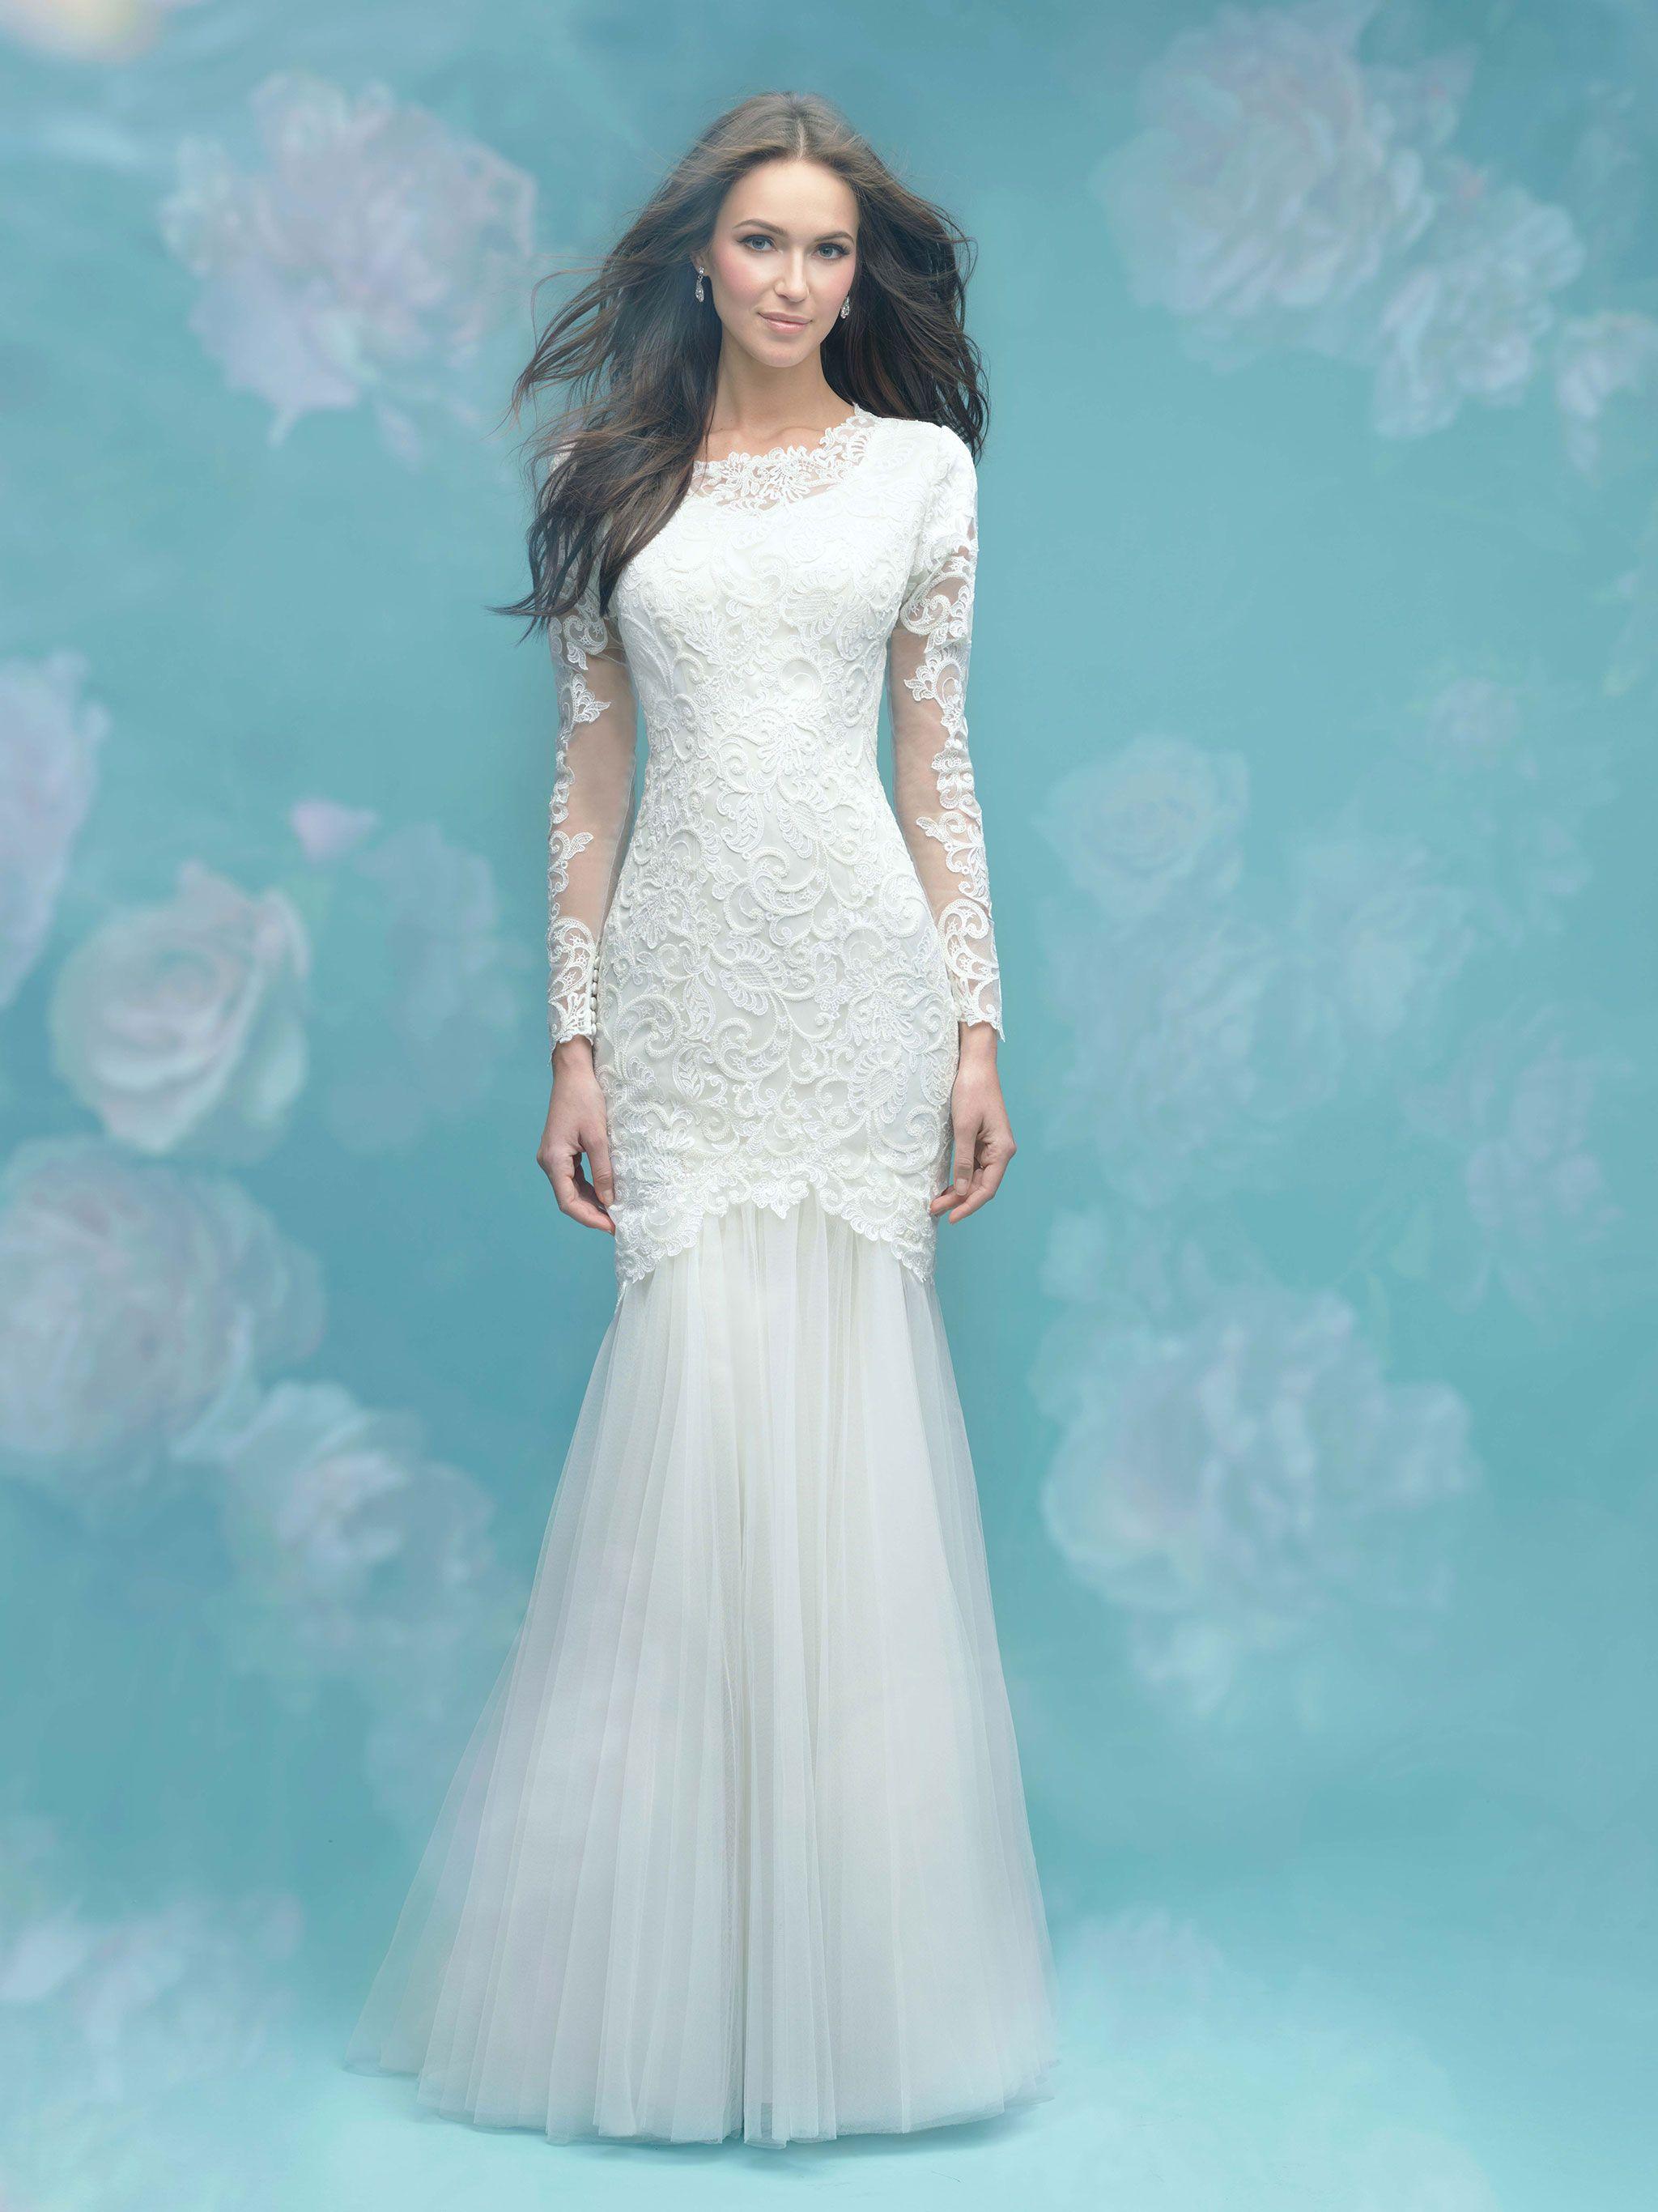 Modest Wedding Dress-Allure Bridals | Modest Wedding Dresses | Pinterest